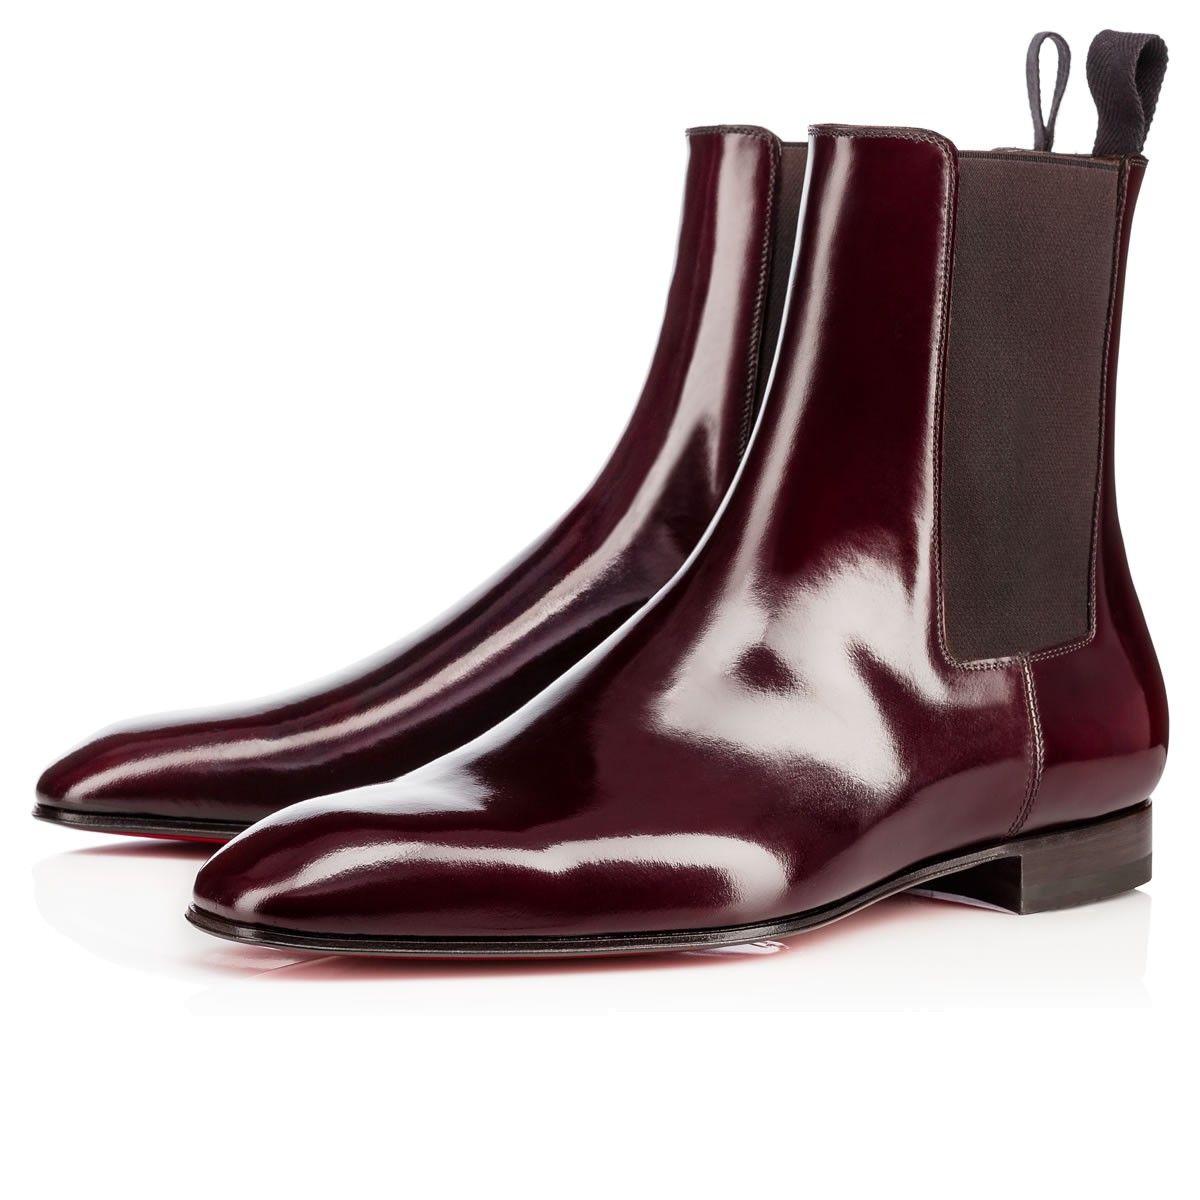 6ae42e03f041 ... usa christian louboutin roadie flat indiana leather. christianlouboutin  shoes a217b ea532